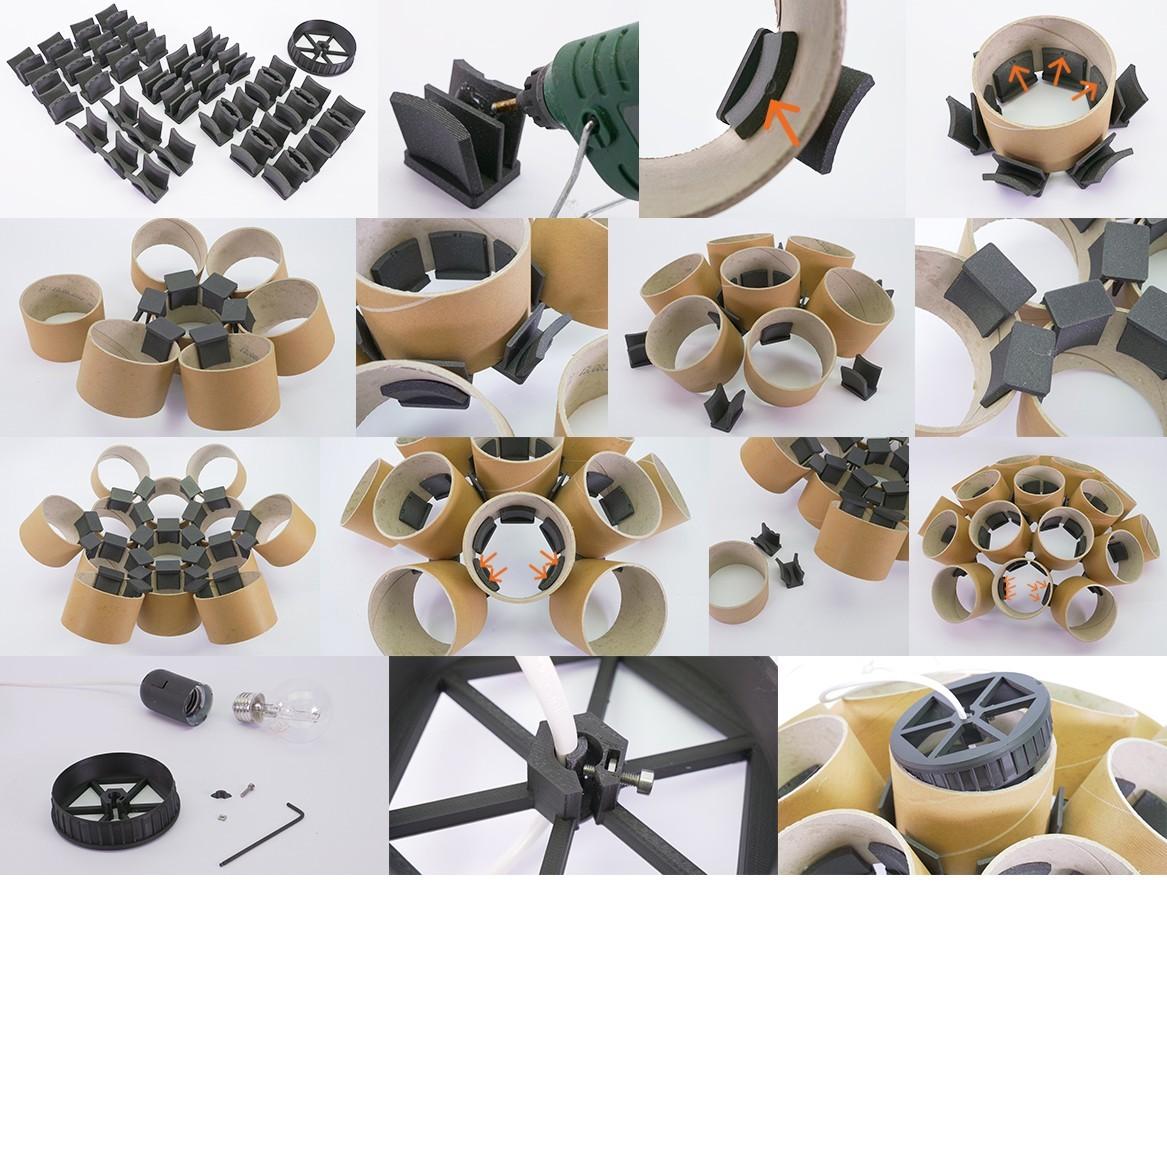 Chandelier_by Dominik Cisar_07_square.jpg Download free STL file CHANDELIER - PRUSAMENT SPOOL - reuse idea • 3D printing template, cisardom